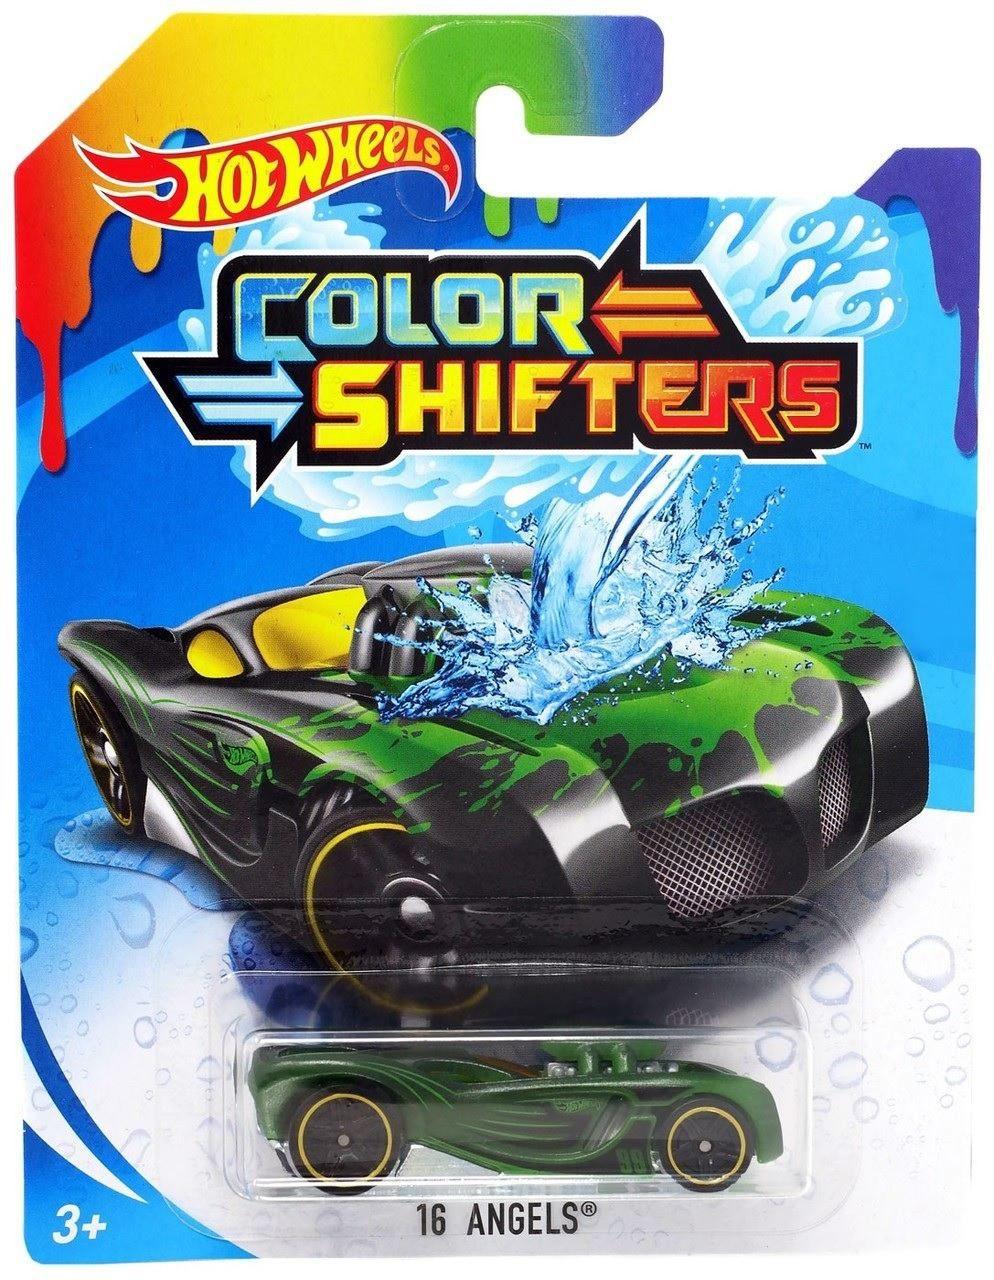 Carrinho Hot Wheels Colour Shifters: 16 Angels - Mattel